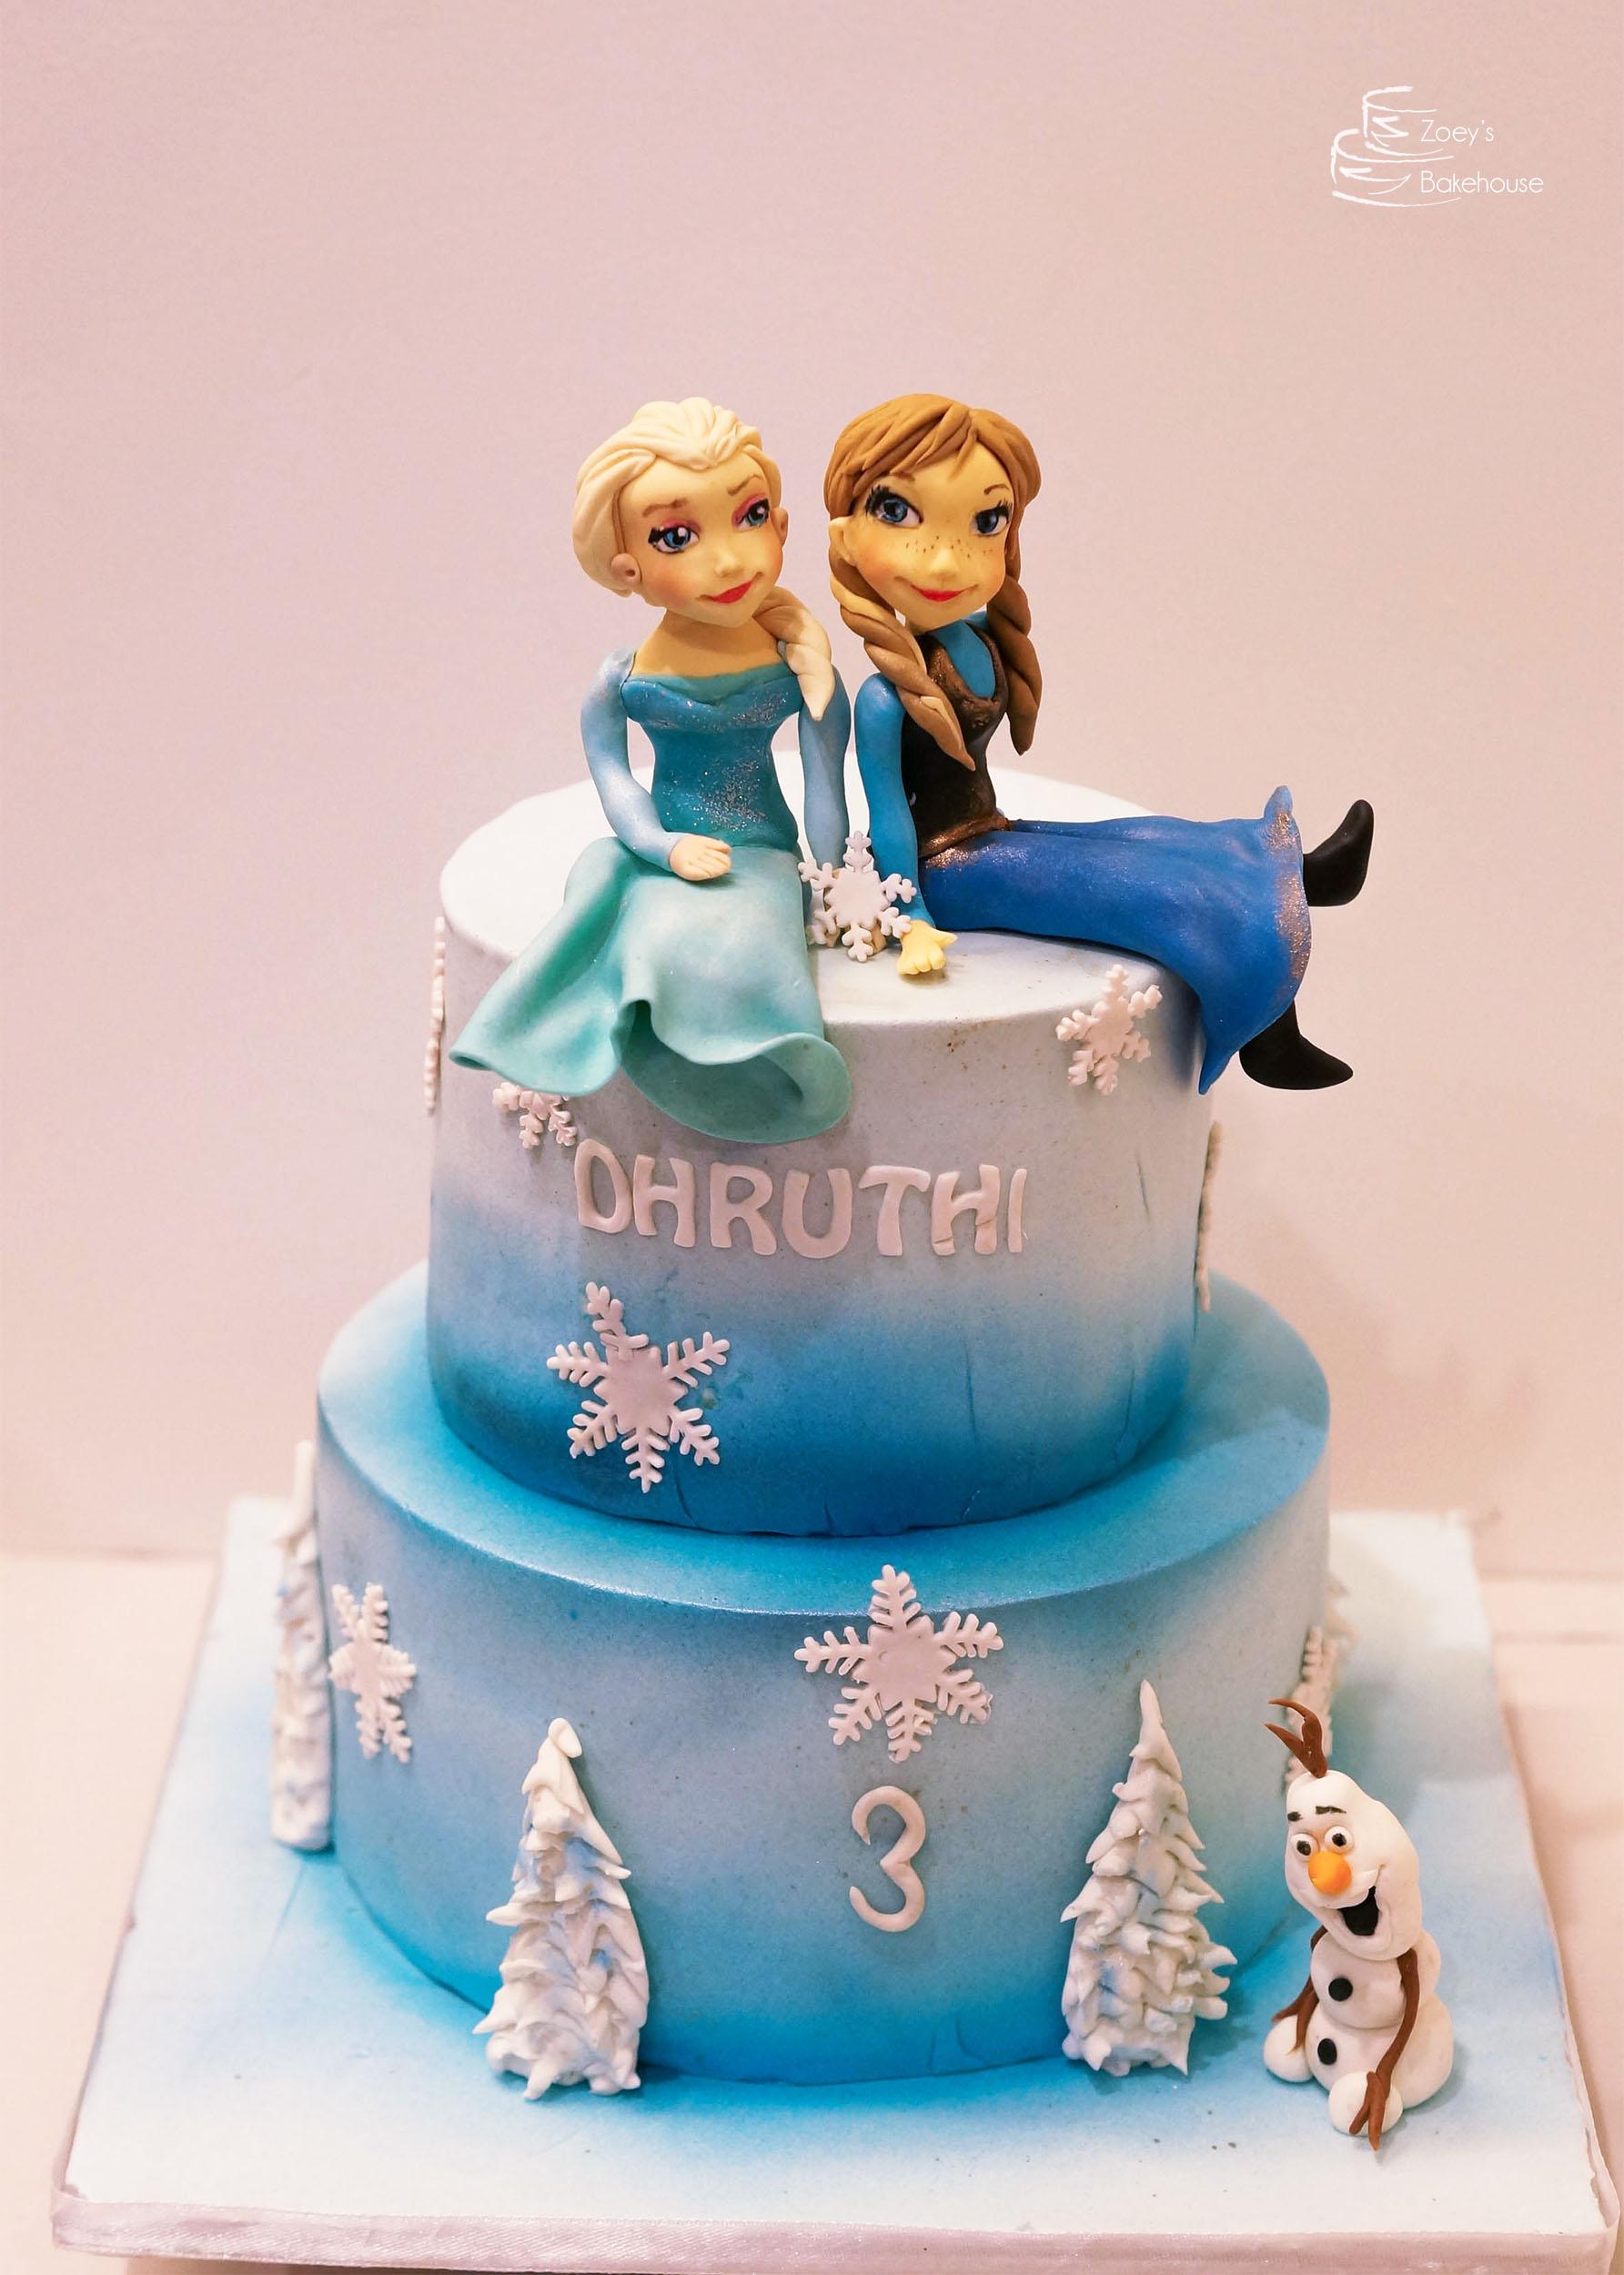 Zoeys bakehouse Princess Birthday Cake Hyderabad